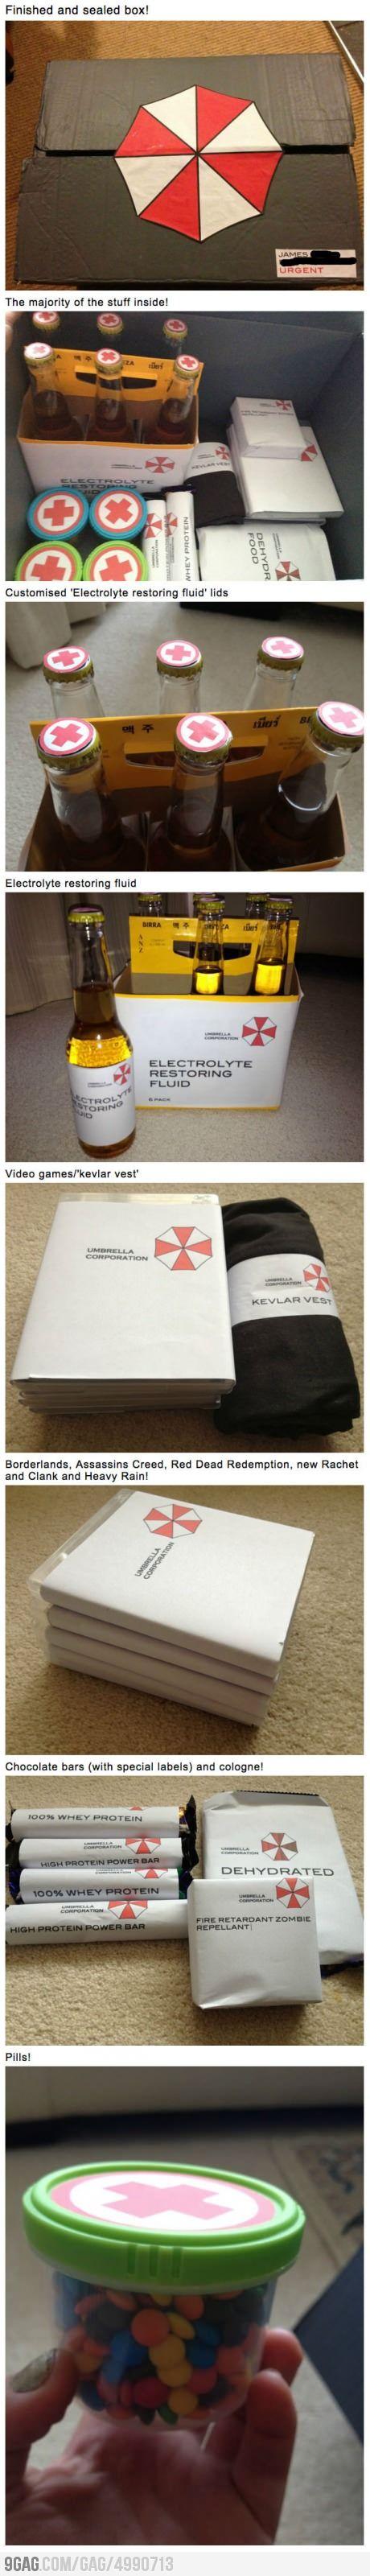 Resident Evil Inspired Zombie Survival Kit - i need 2 make this